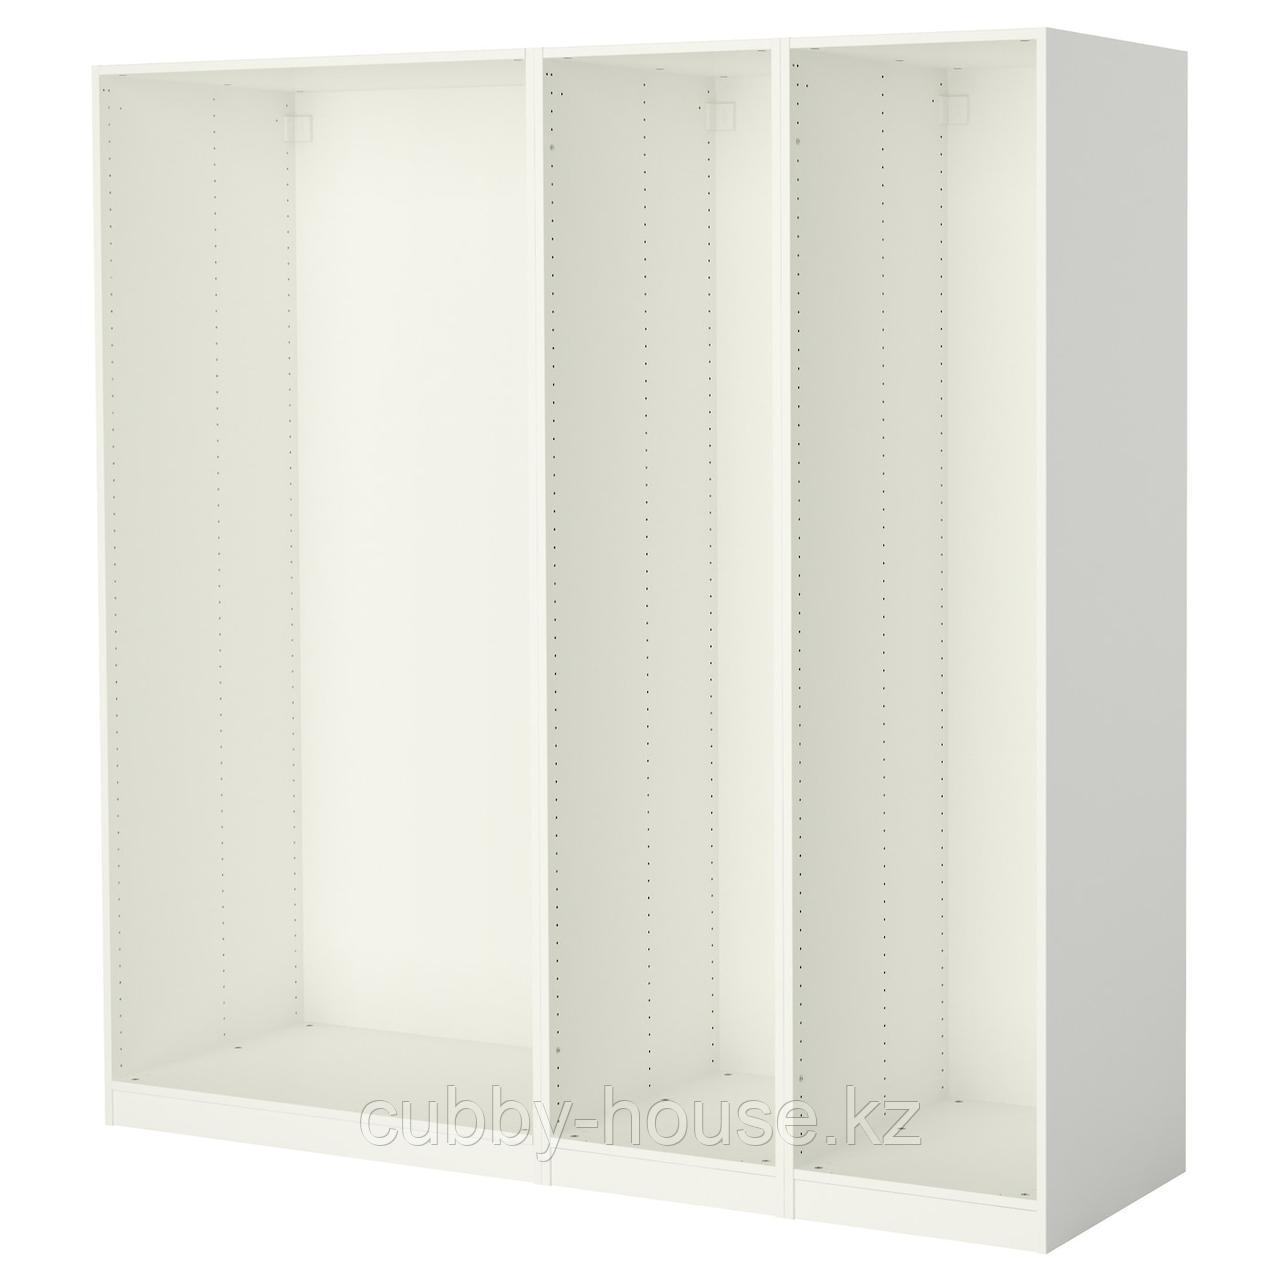 ПАКС 3 каркаса гардеробов, белый, 200x58x201 см